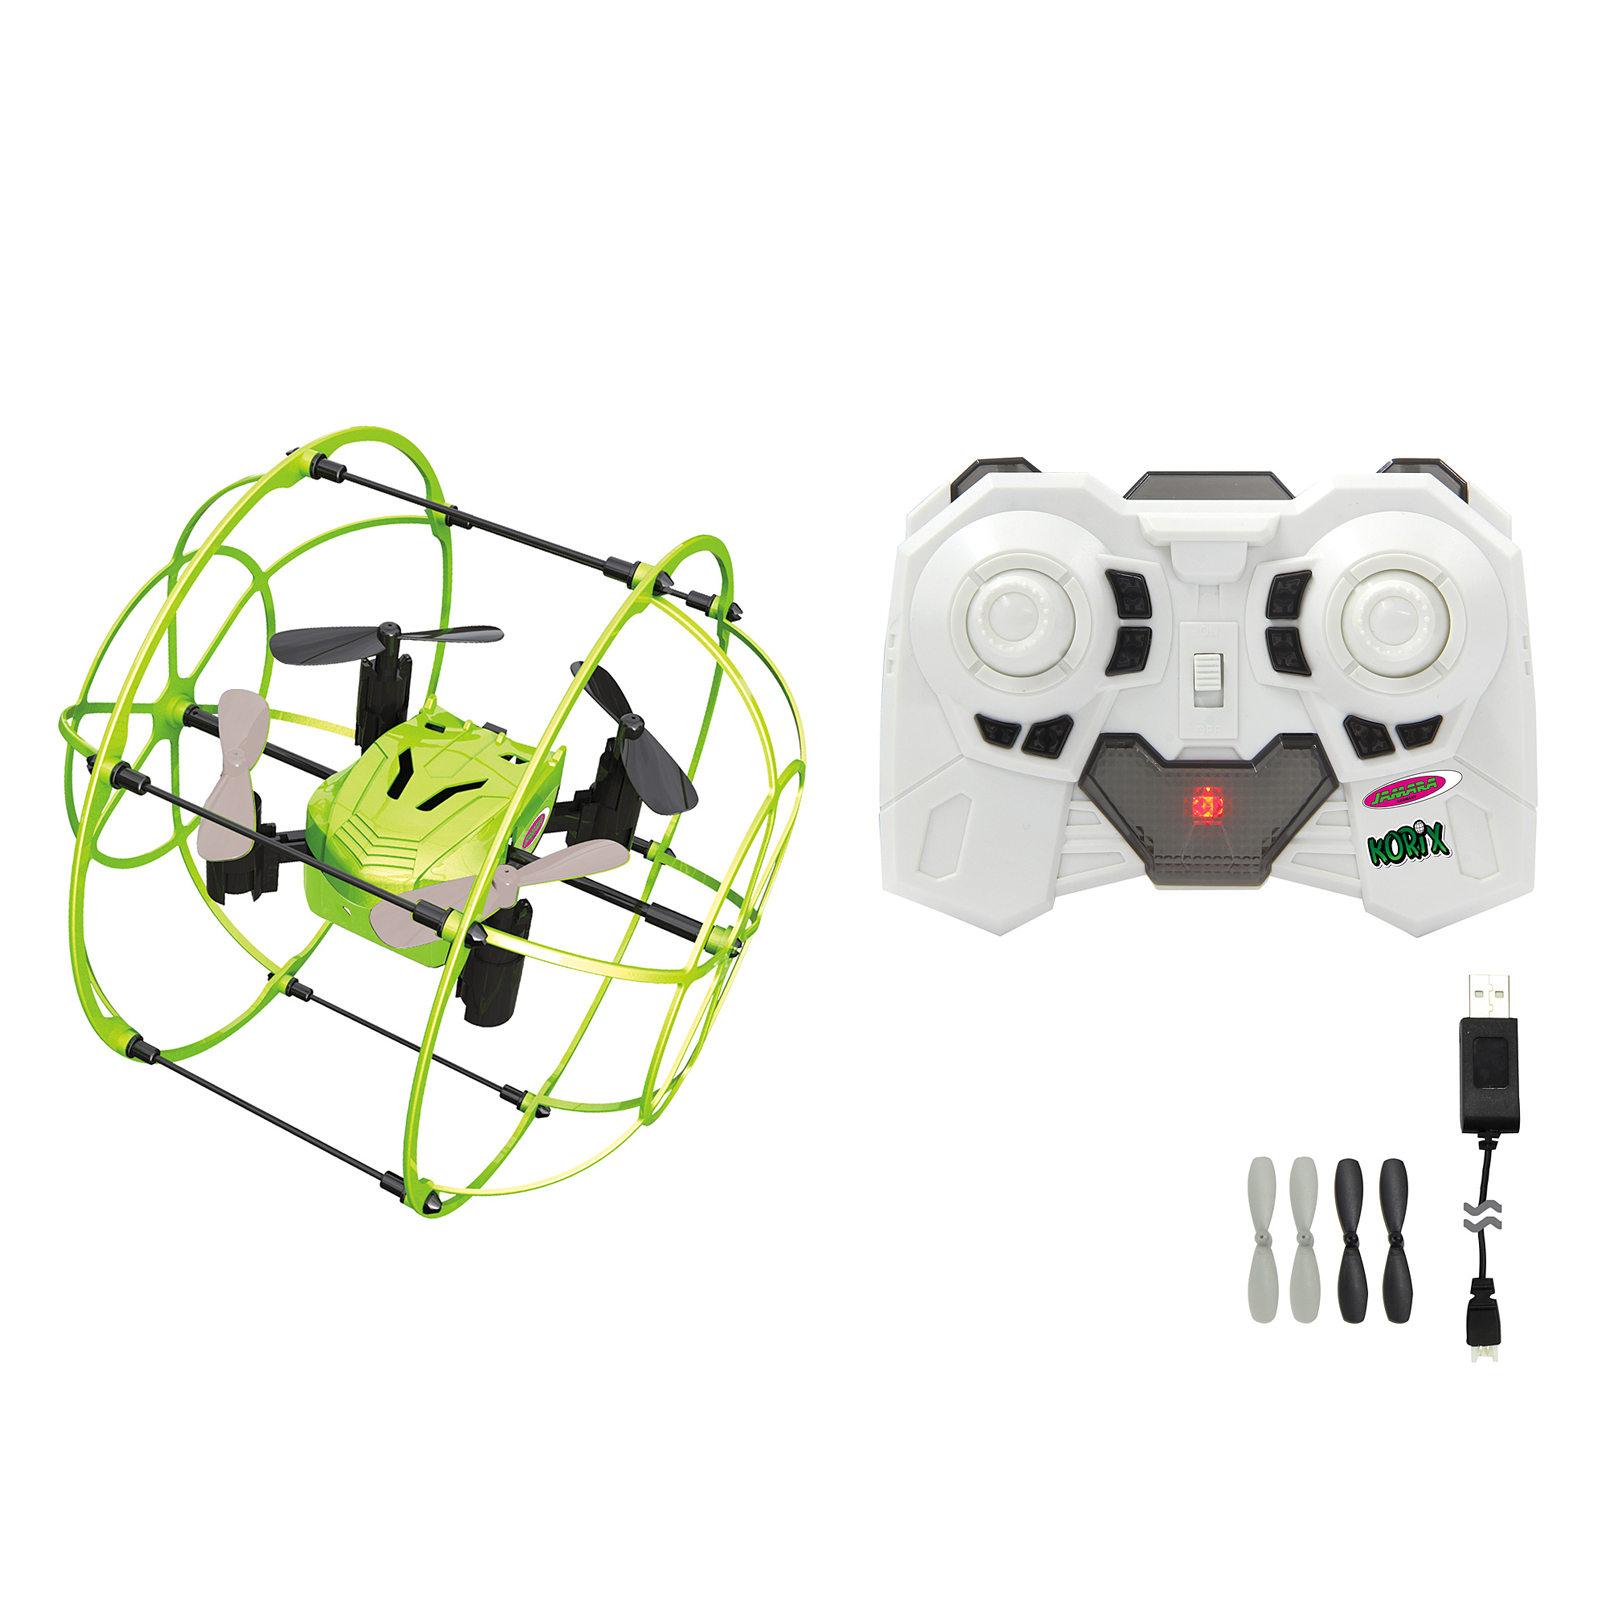 Jamara korix Quadrocopter 422023, Green 4042774433840 | eBay